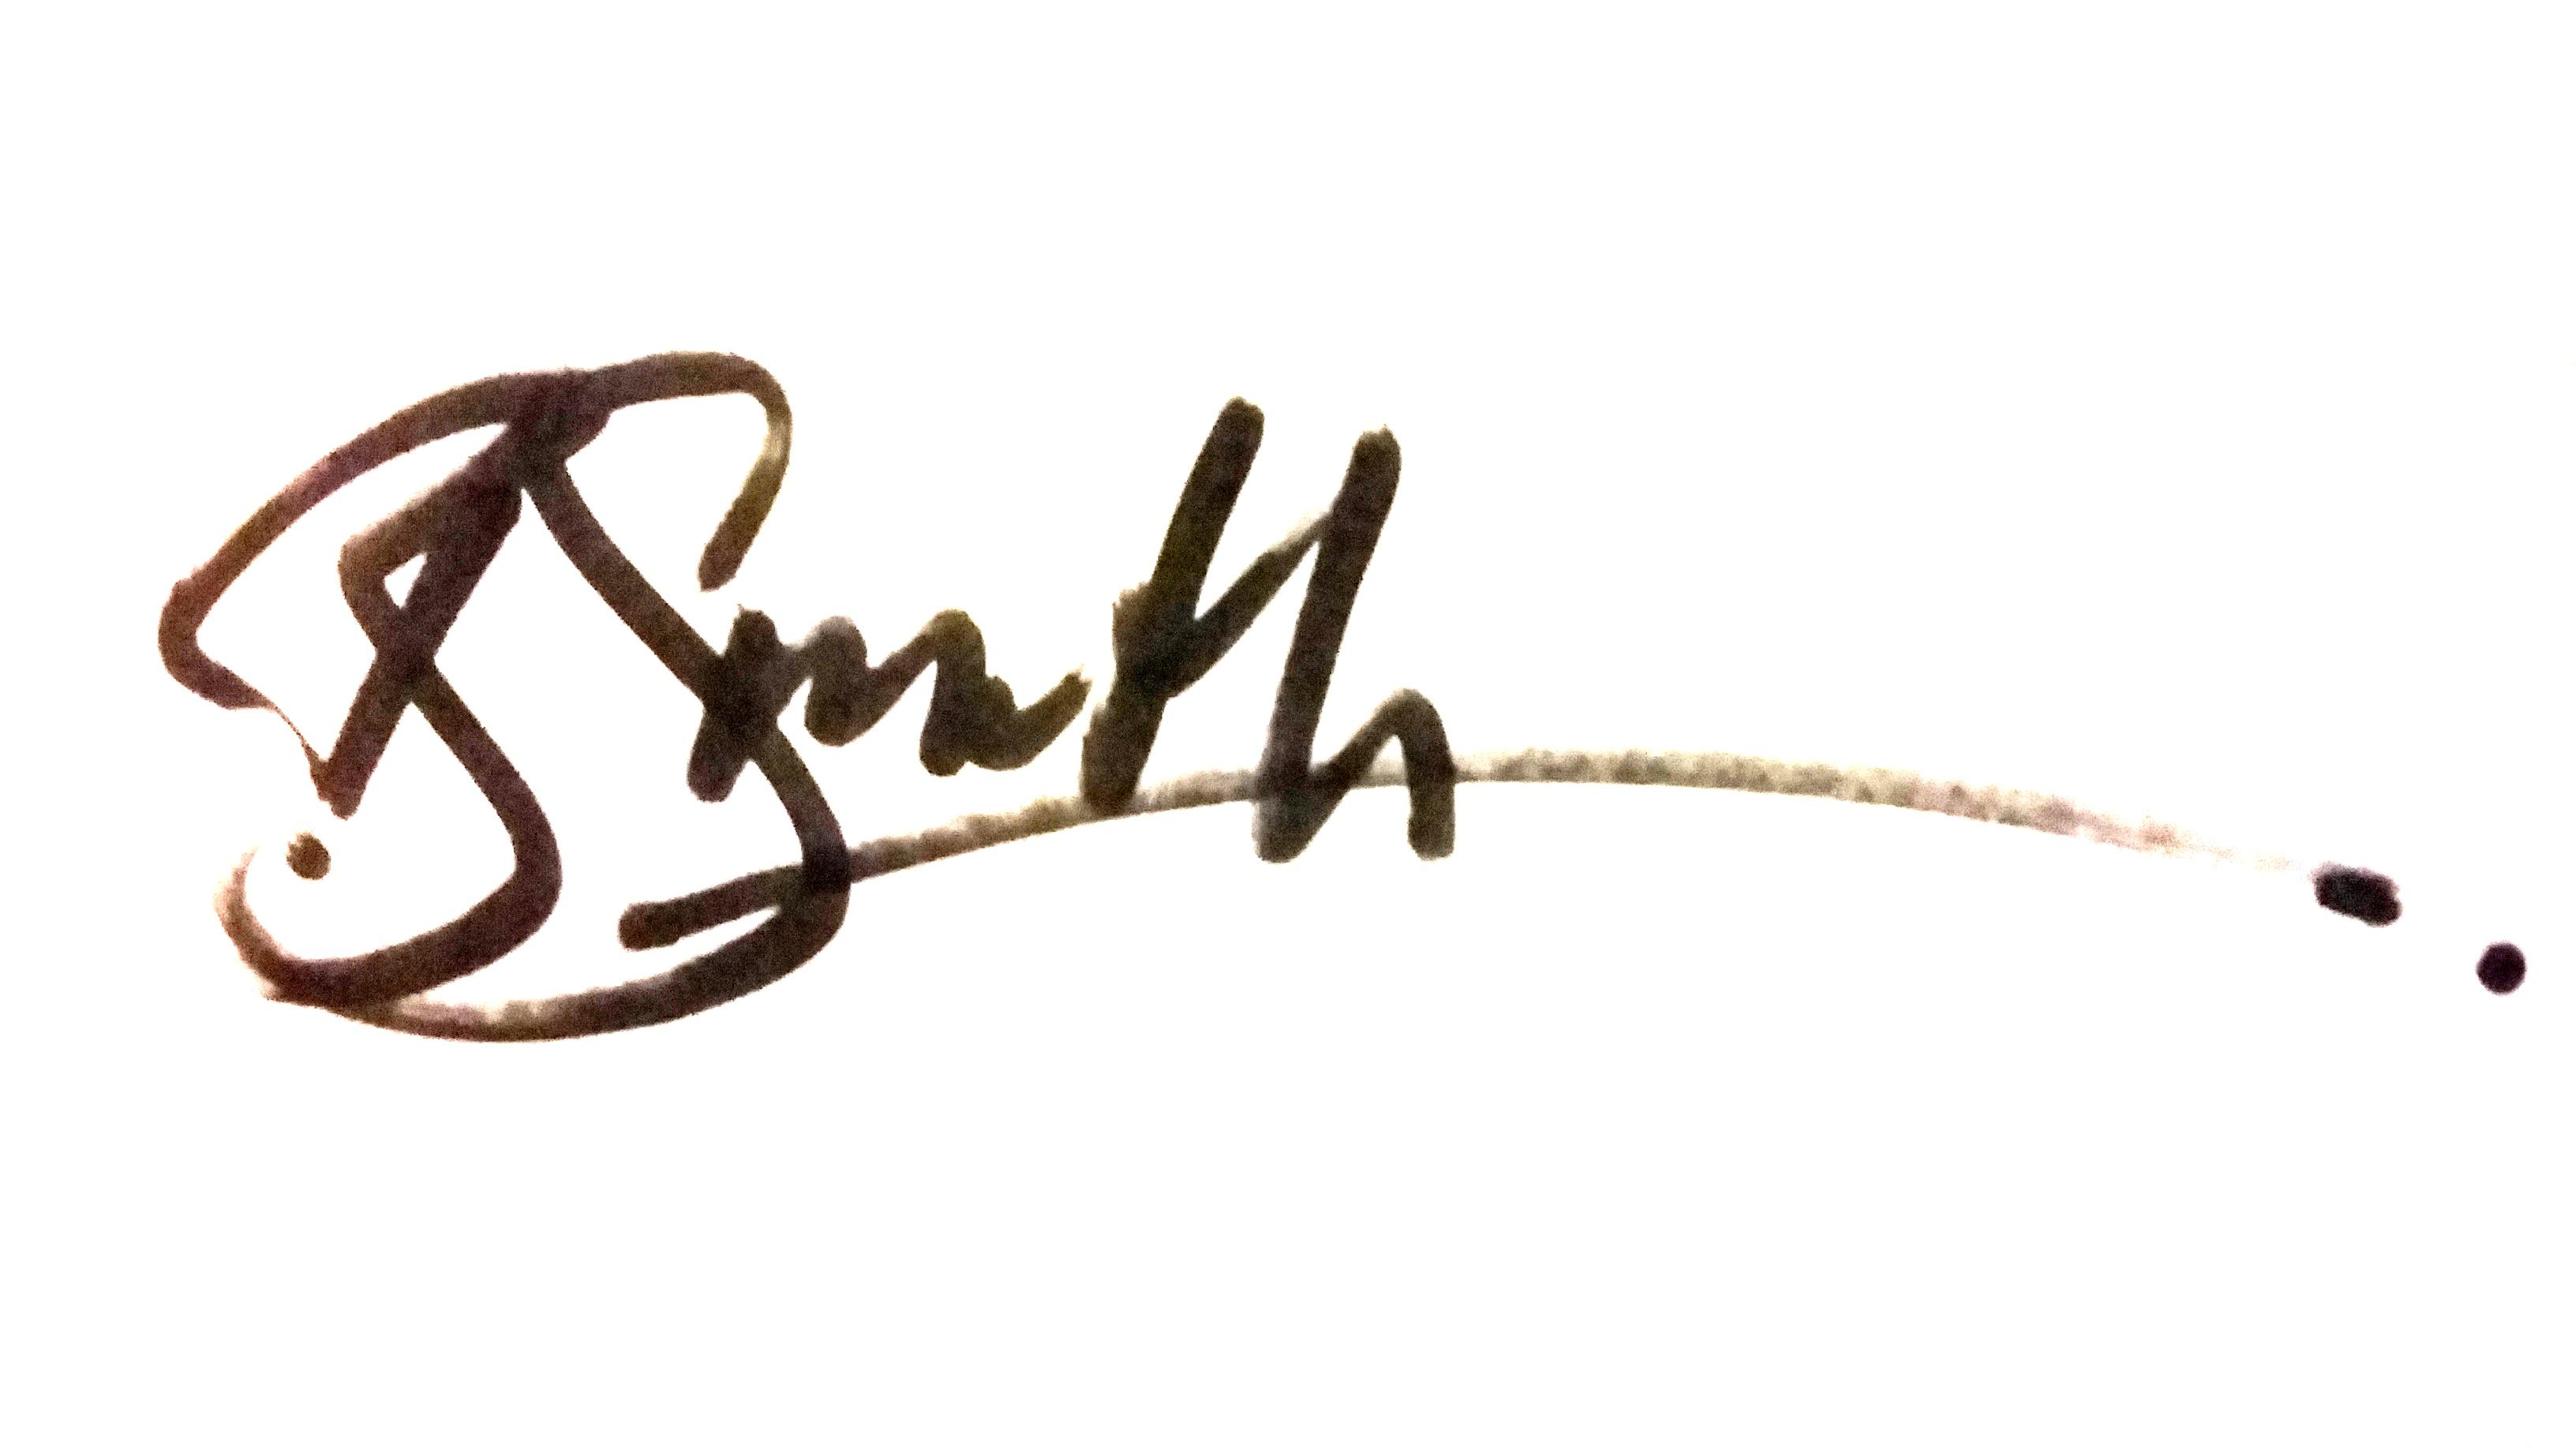 Ben Smith's Signature